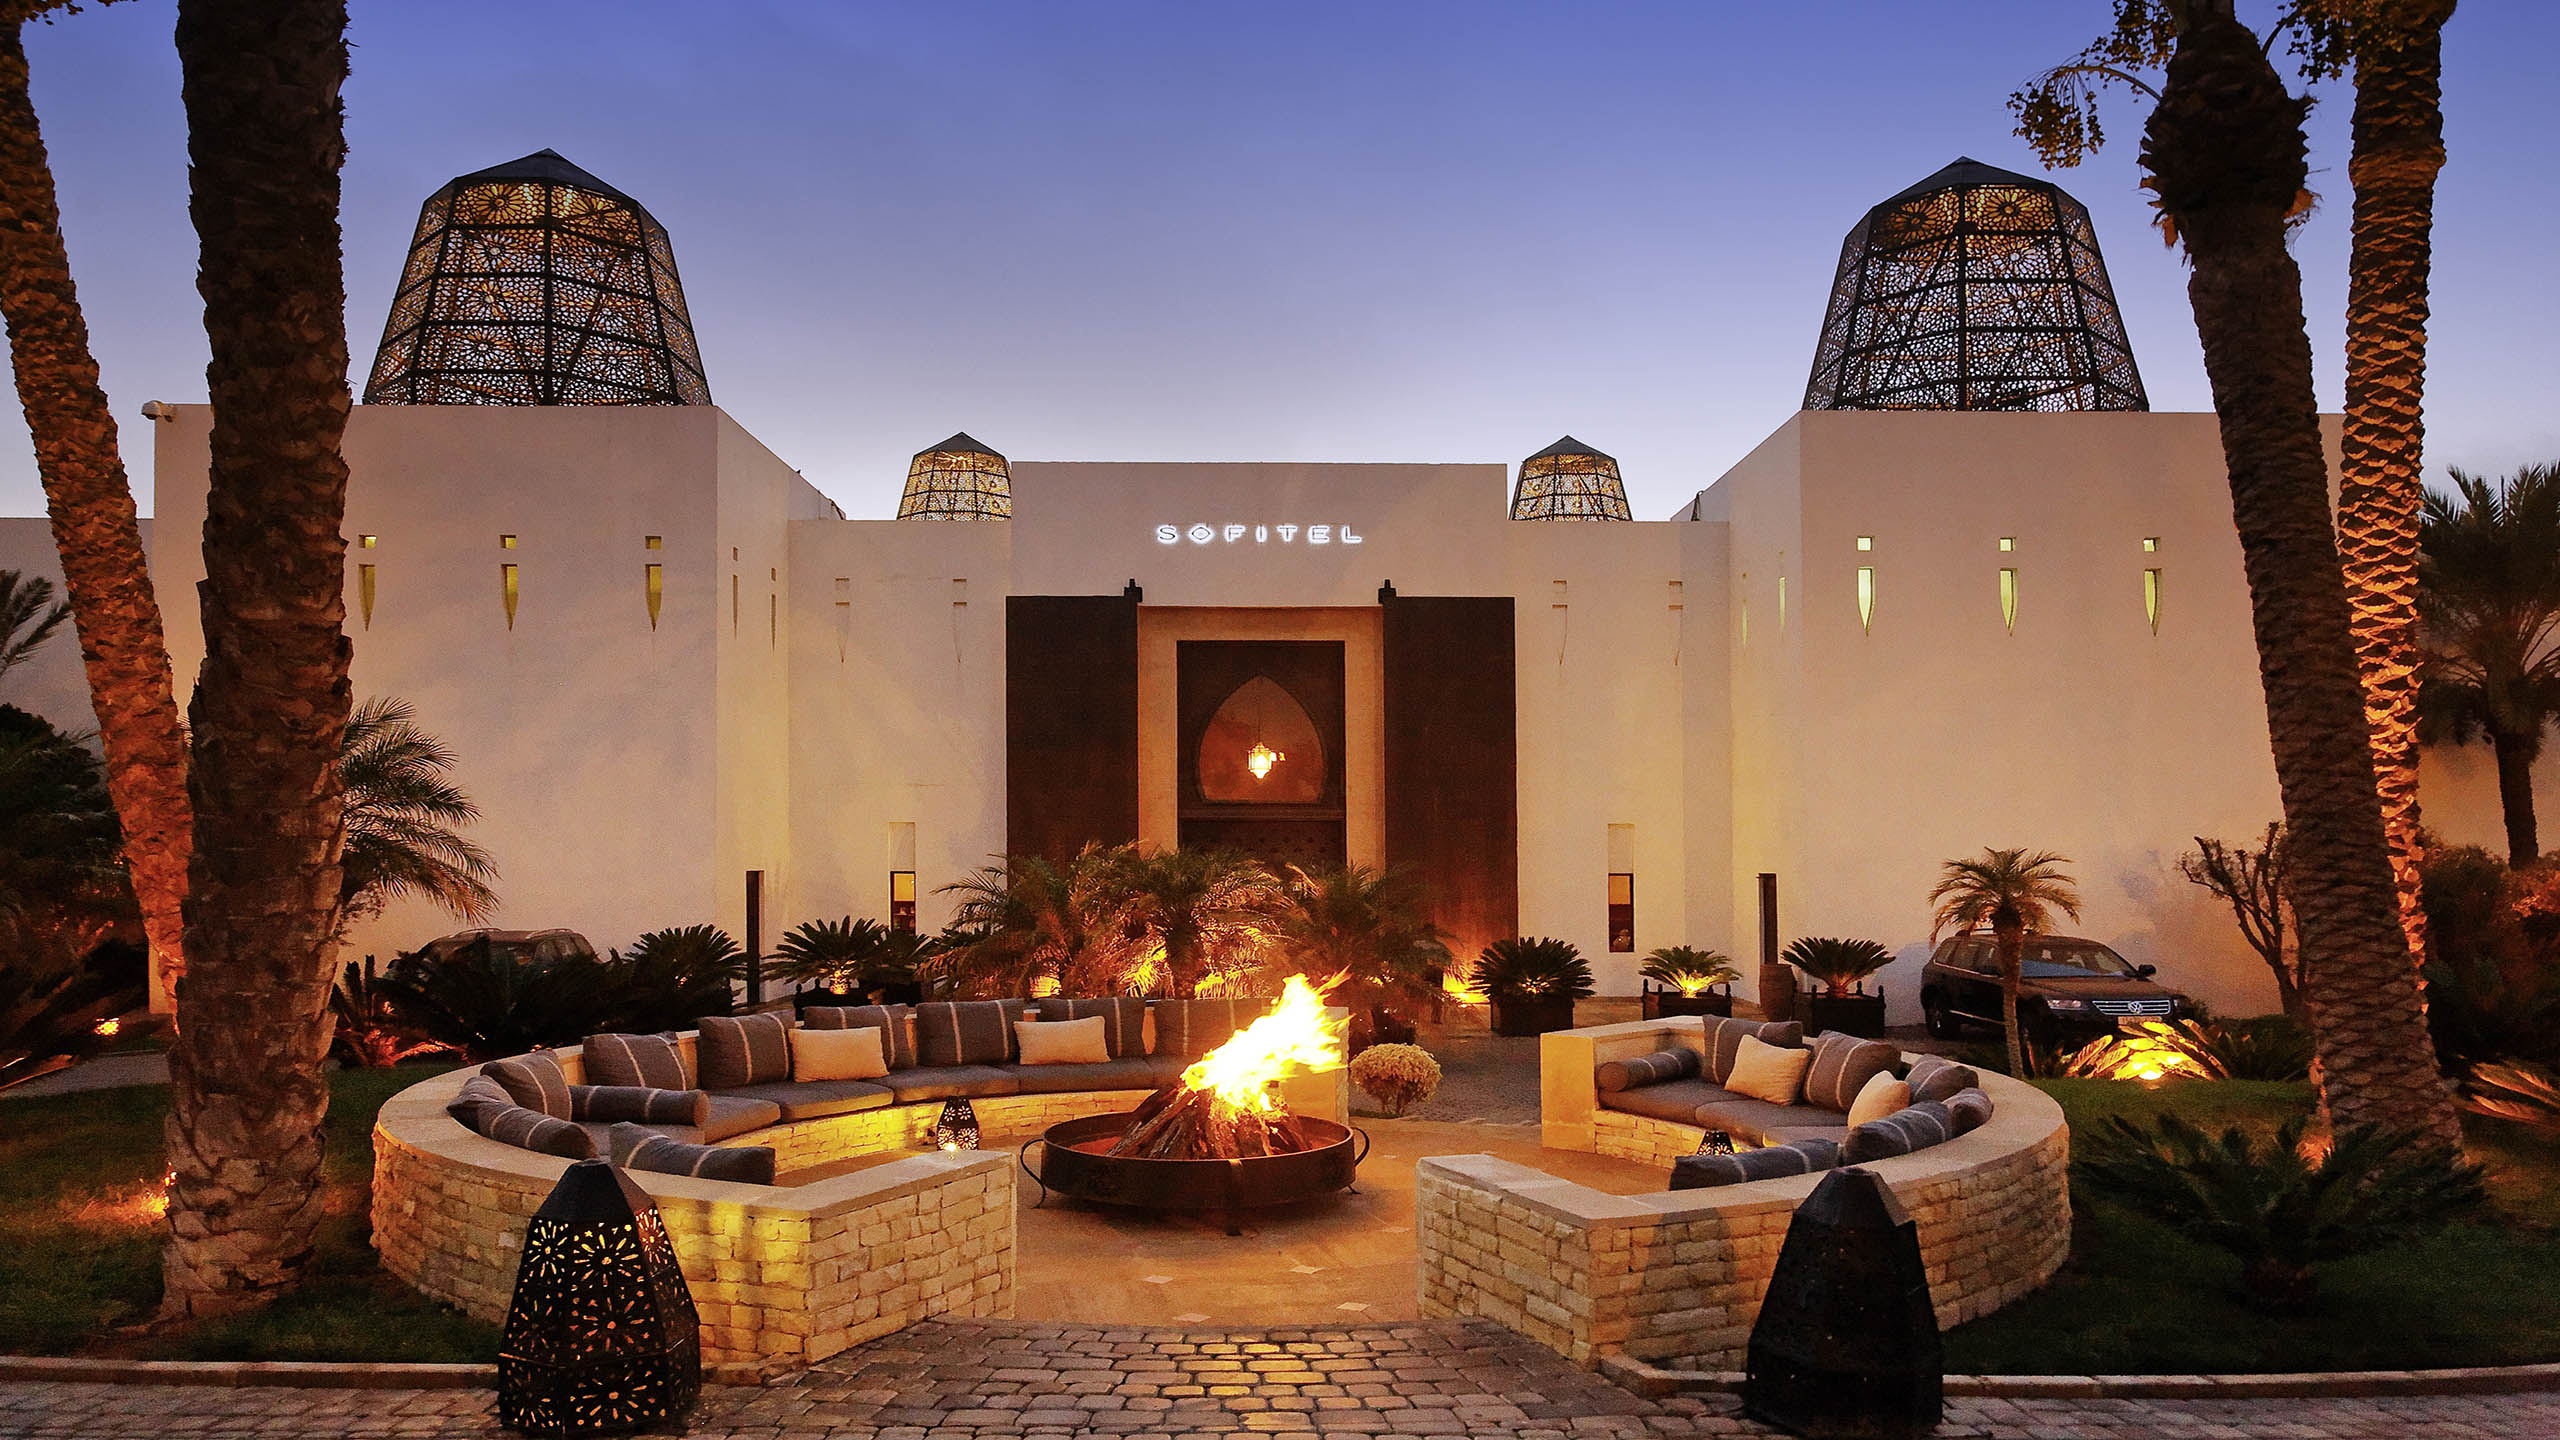 L Artigiano Del Lusso Bijoux hotel di lusso a agadir – sofitel agadir royal bay resort